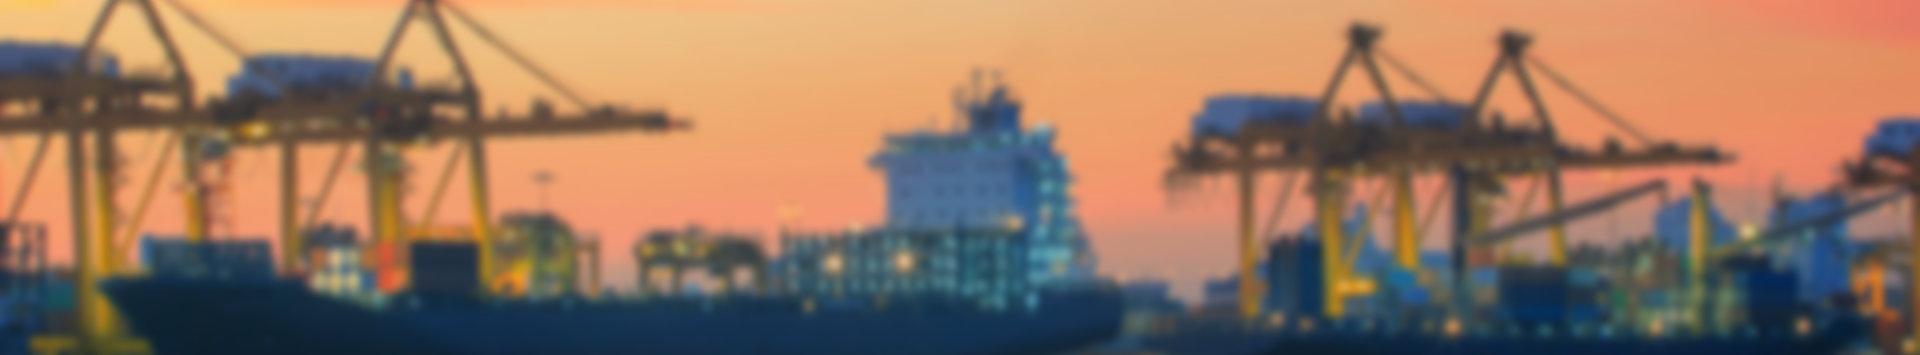 ship port use for transportation